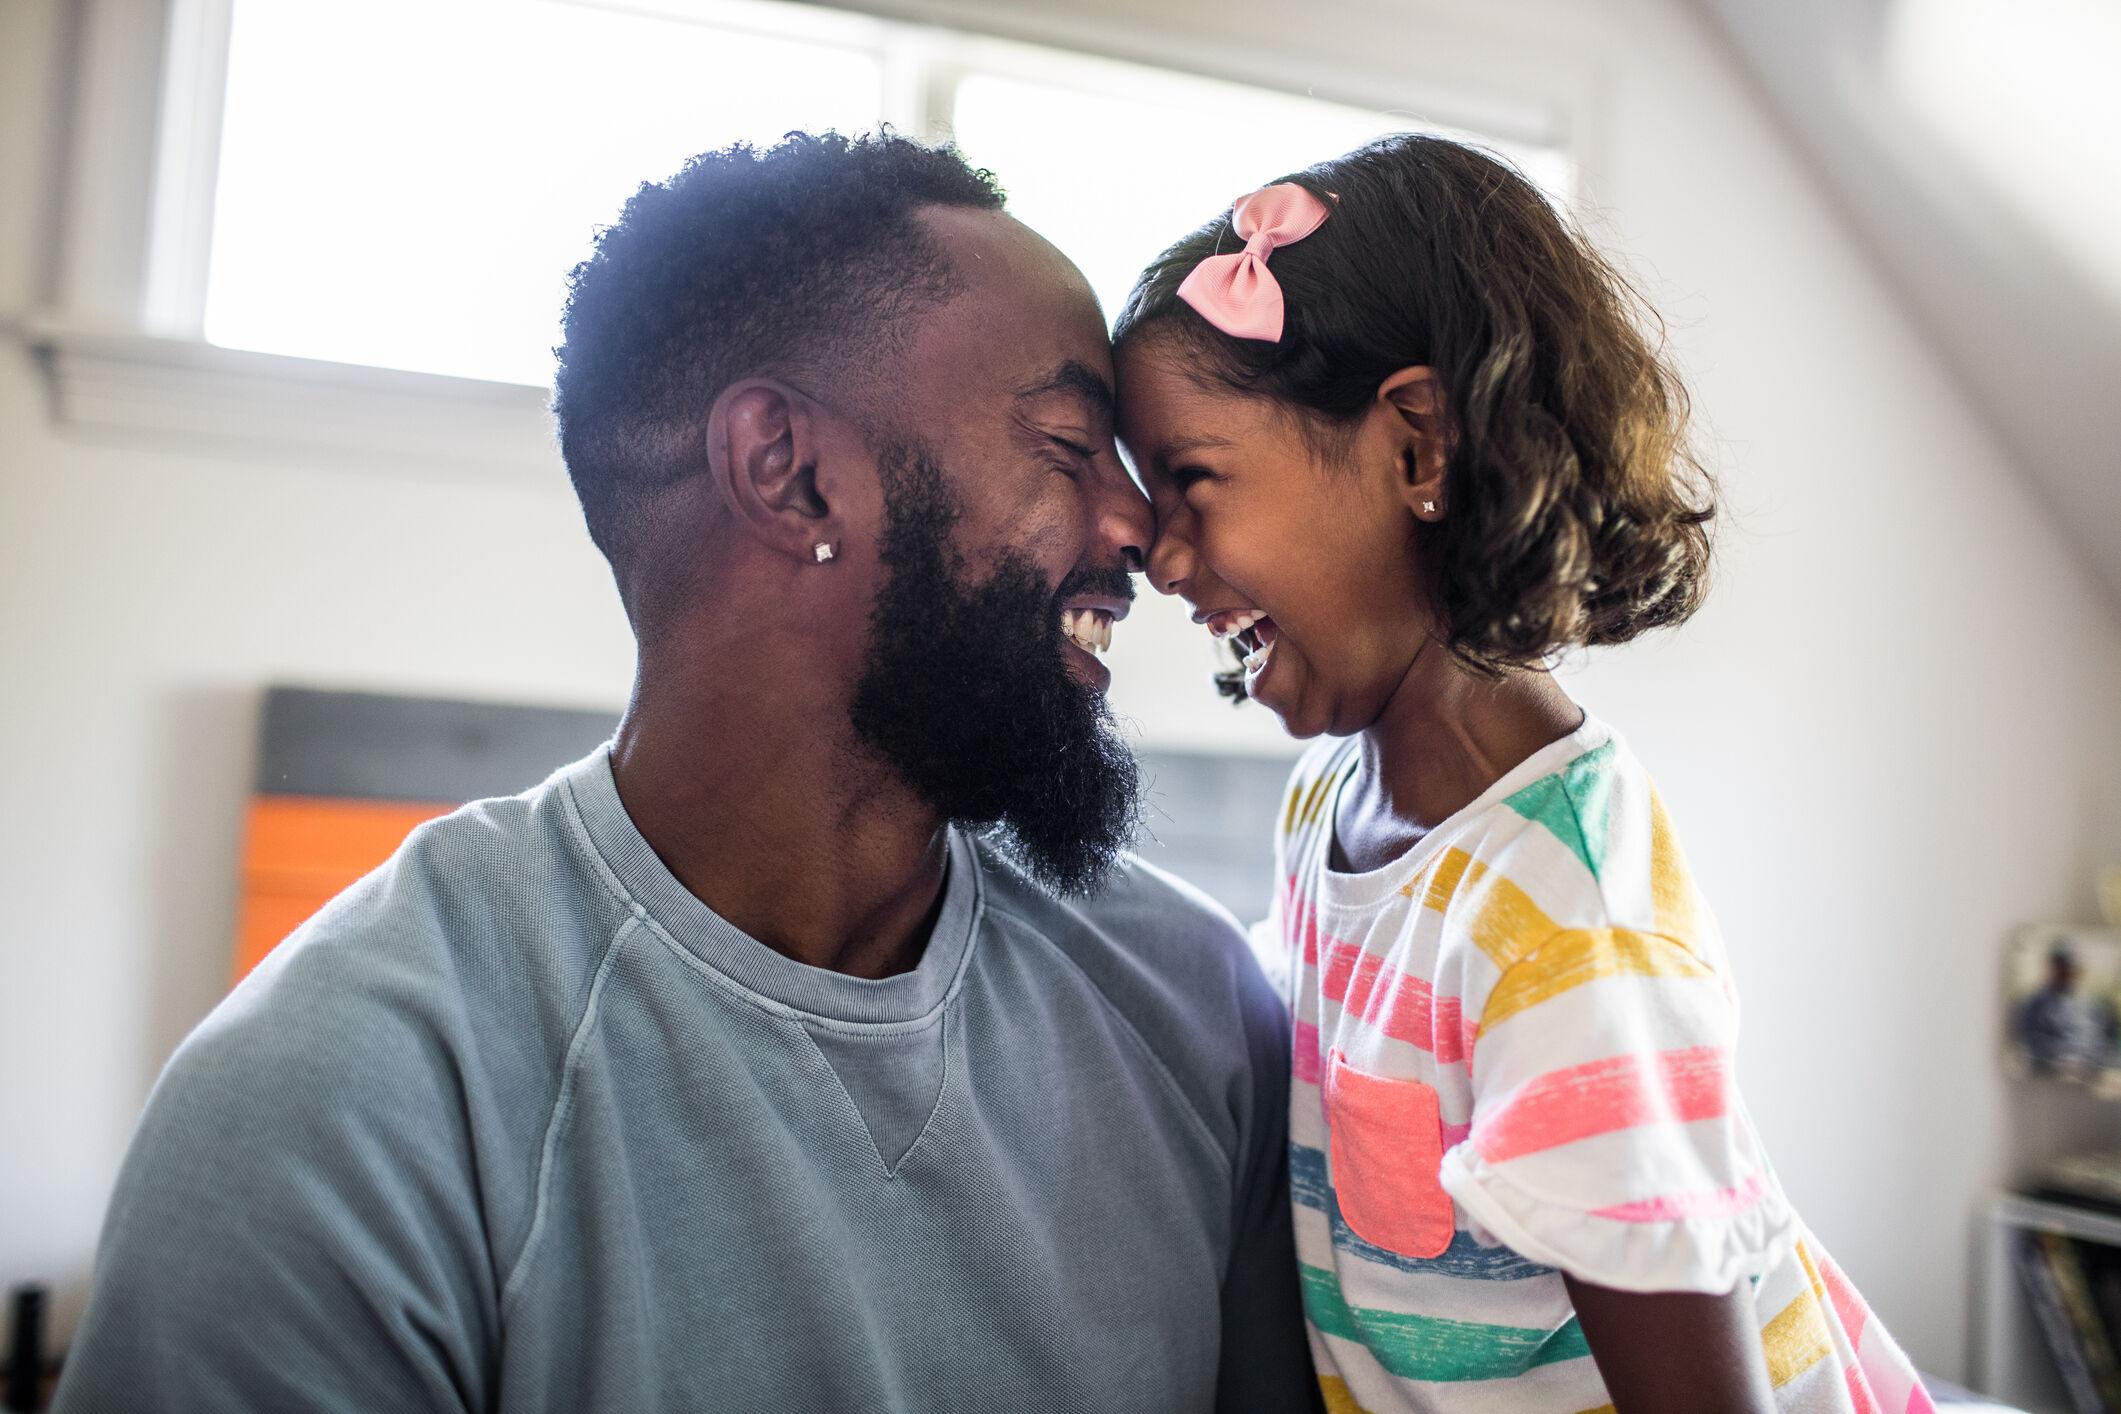 Pai e filha sorrindo